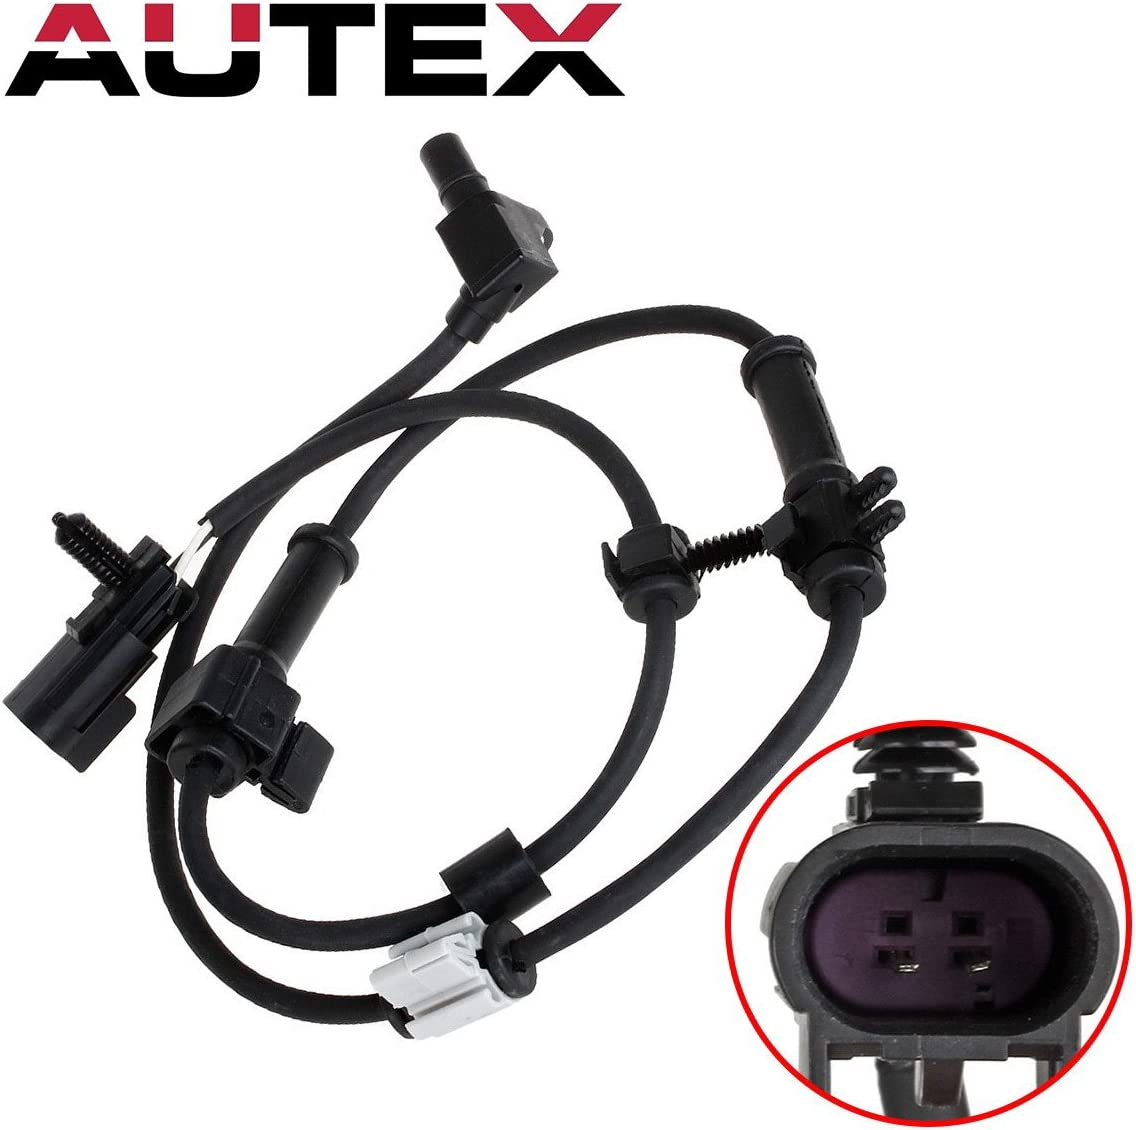 Front ABS Wheel Speed Sensor 5S7978 For 02-06 Chevrolet Trailblazer EXT 4.2 5.3L